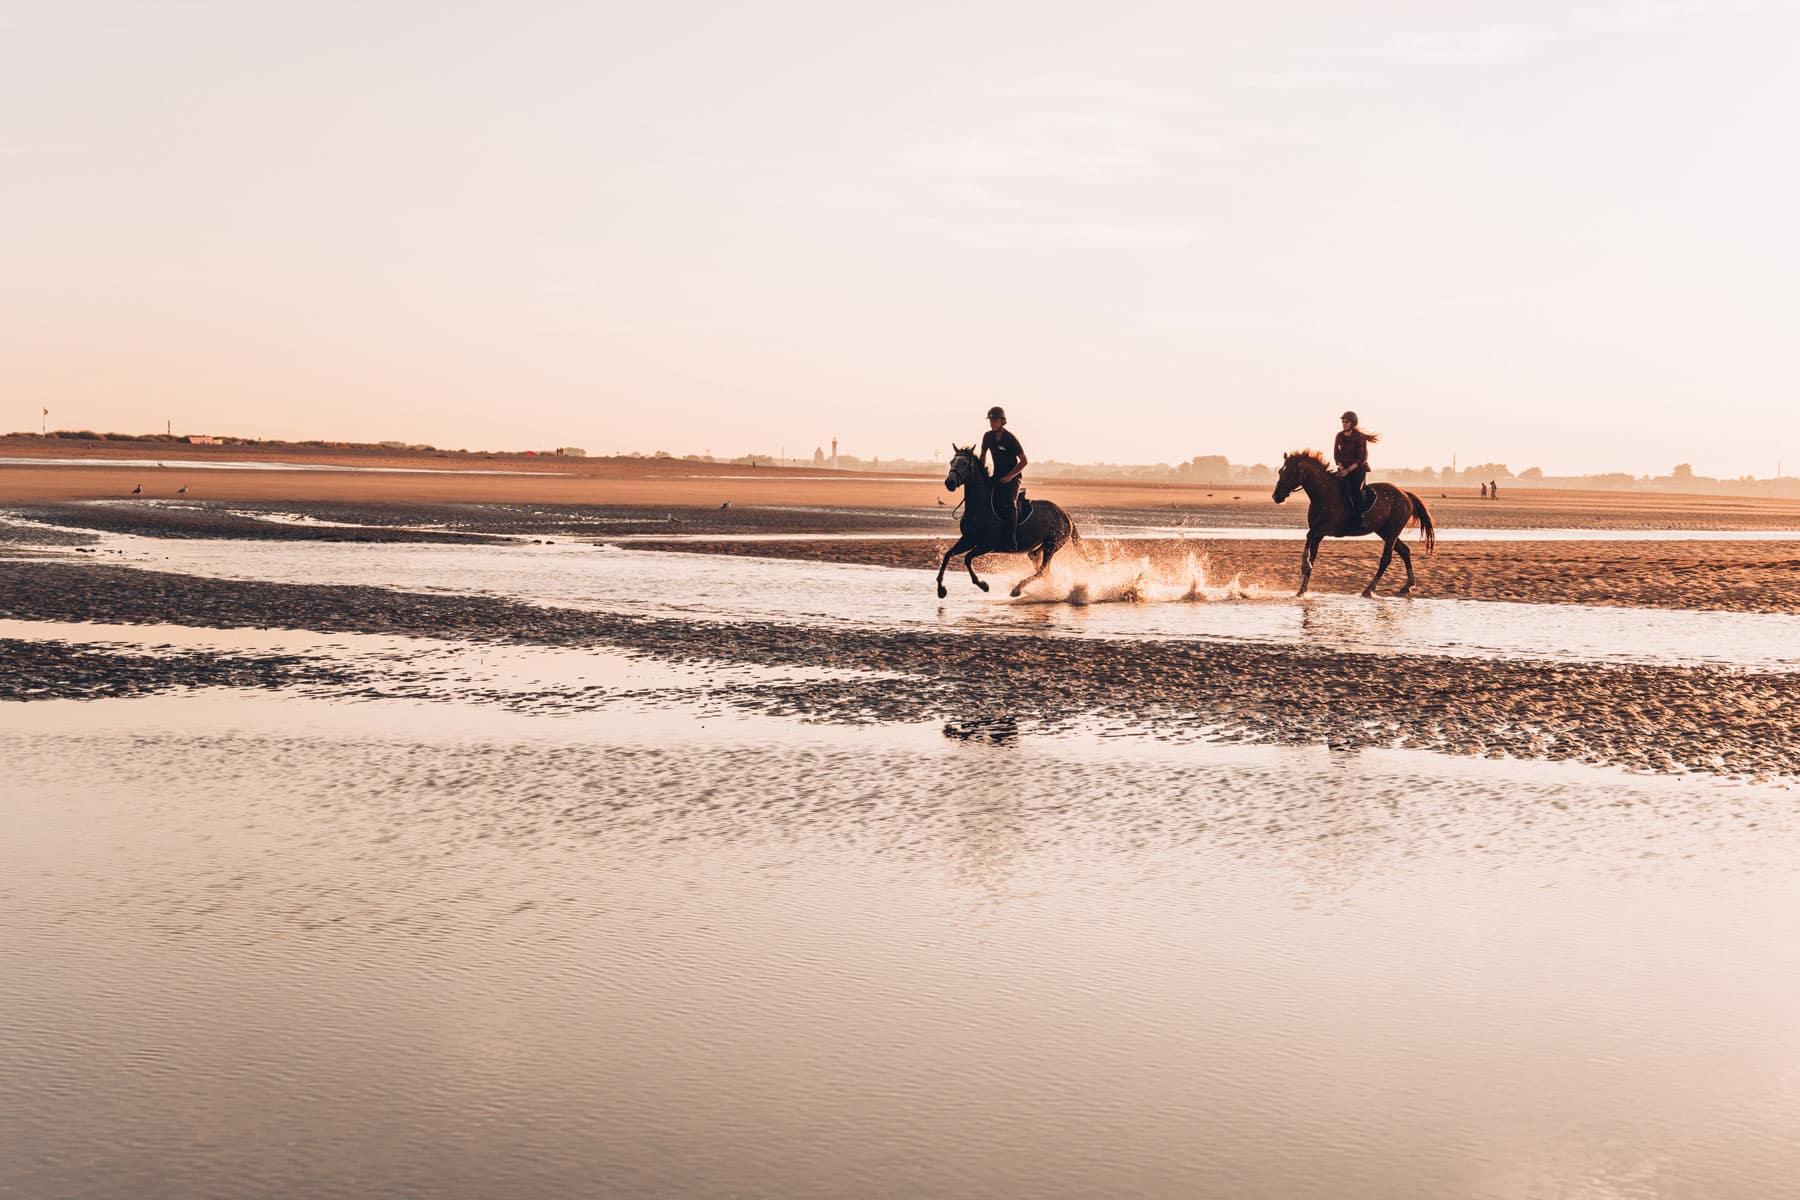 Balade à cheval sur la plage en Normandie